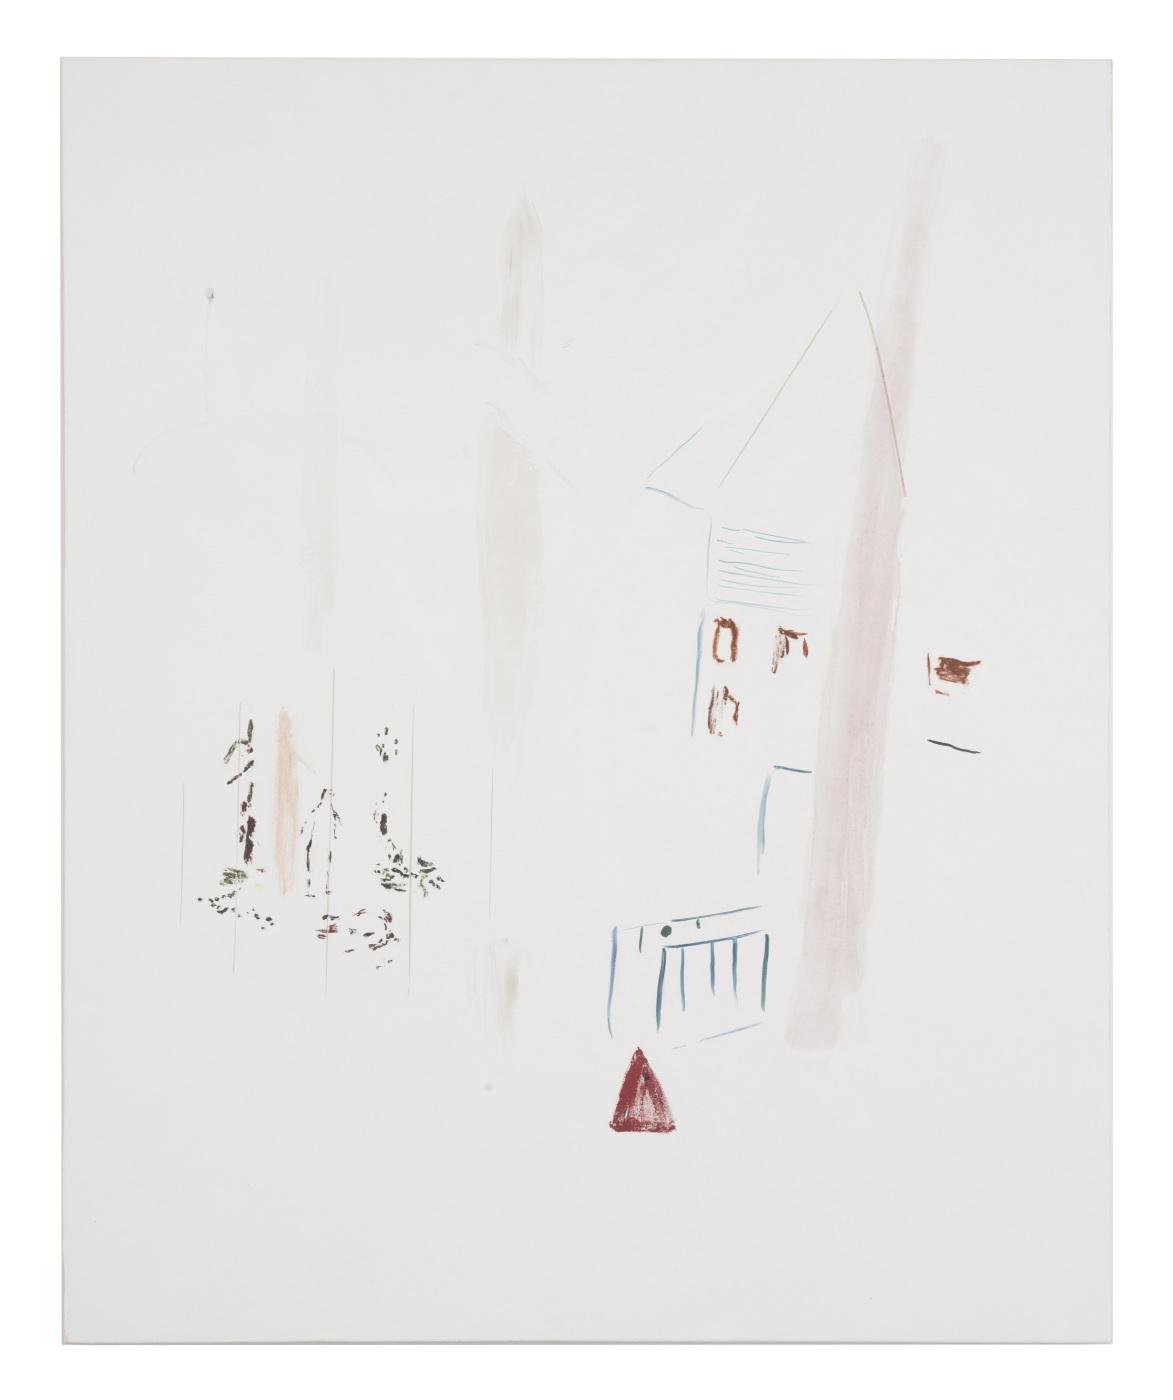 T293 - Henry Chapman - 15